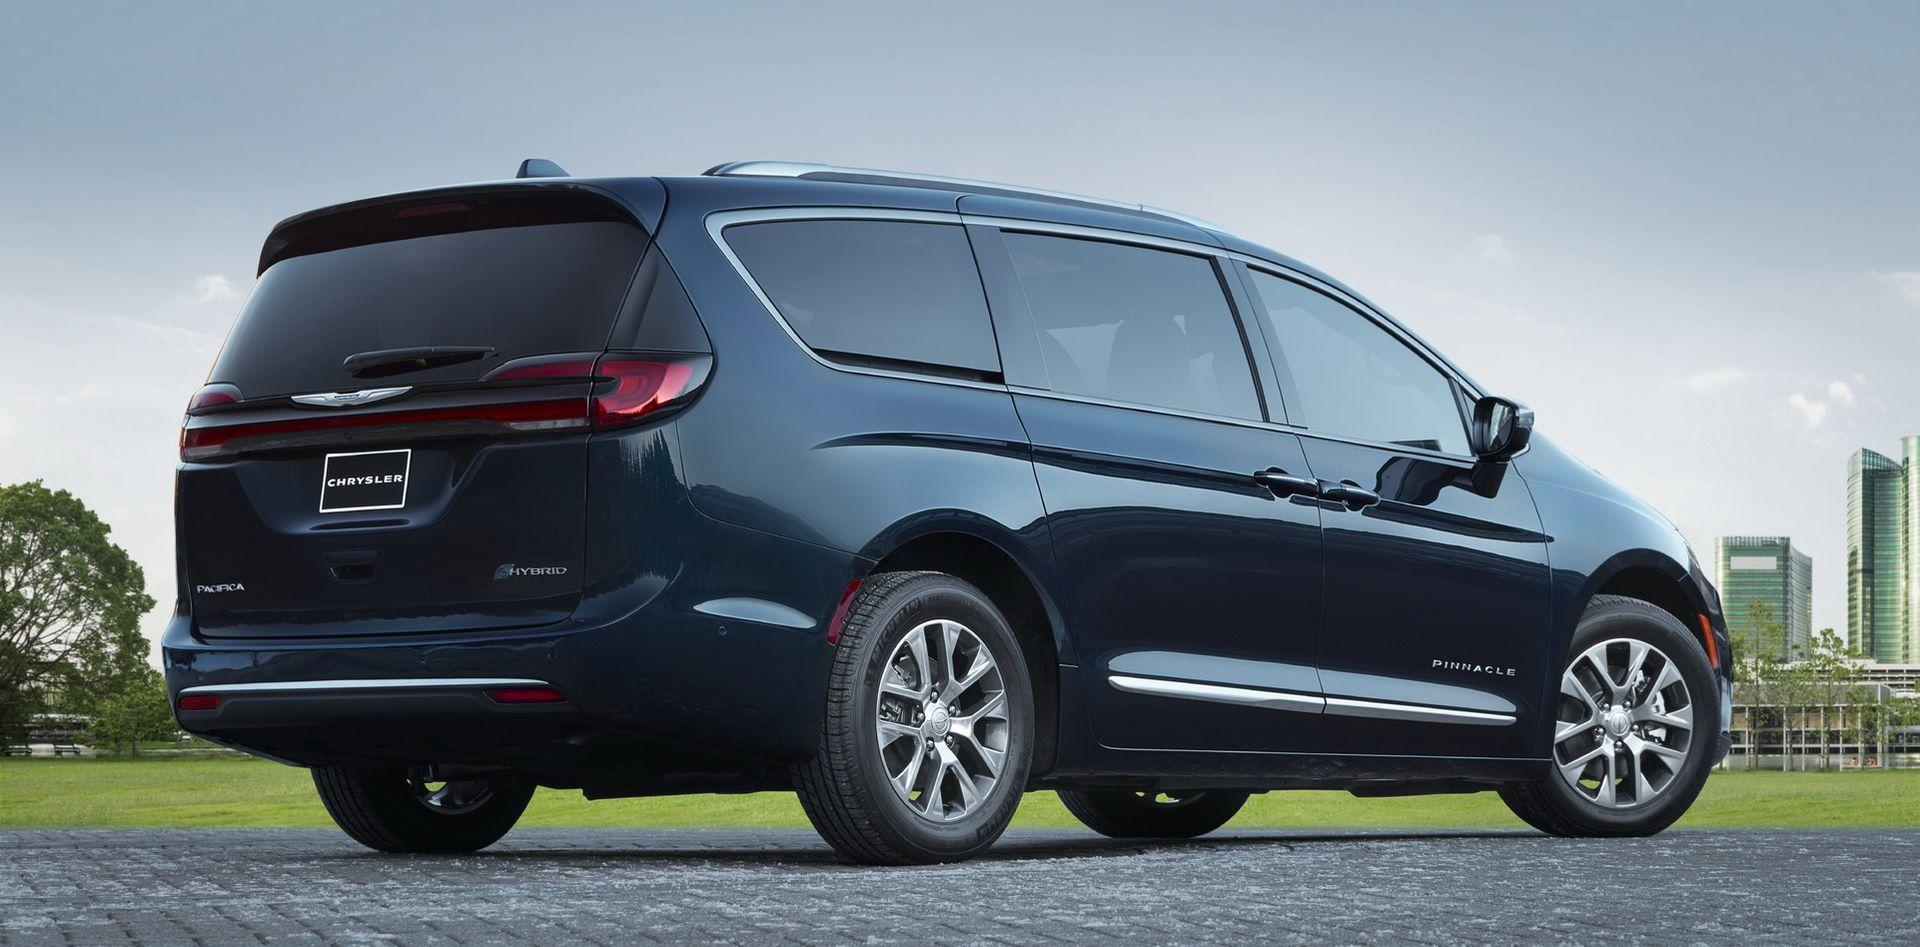 2021-Chrysler-Pacifica-58